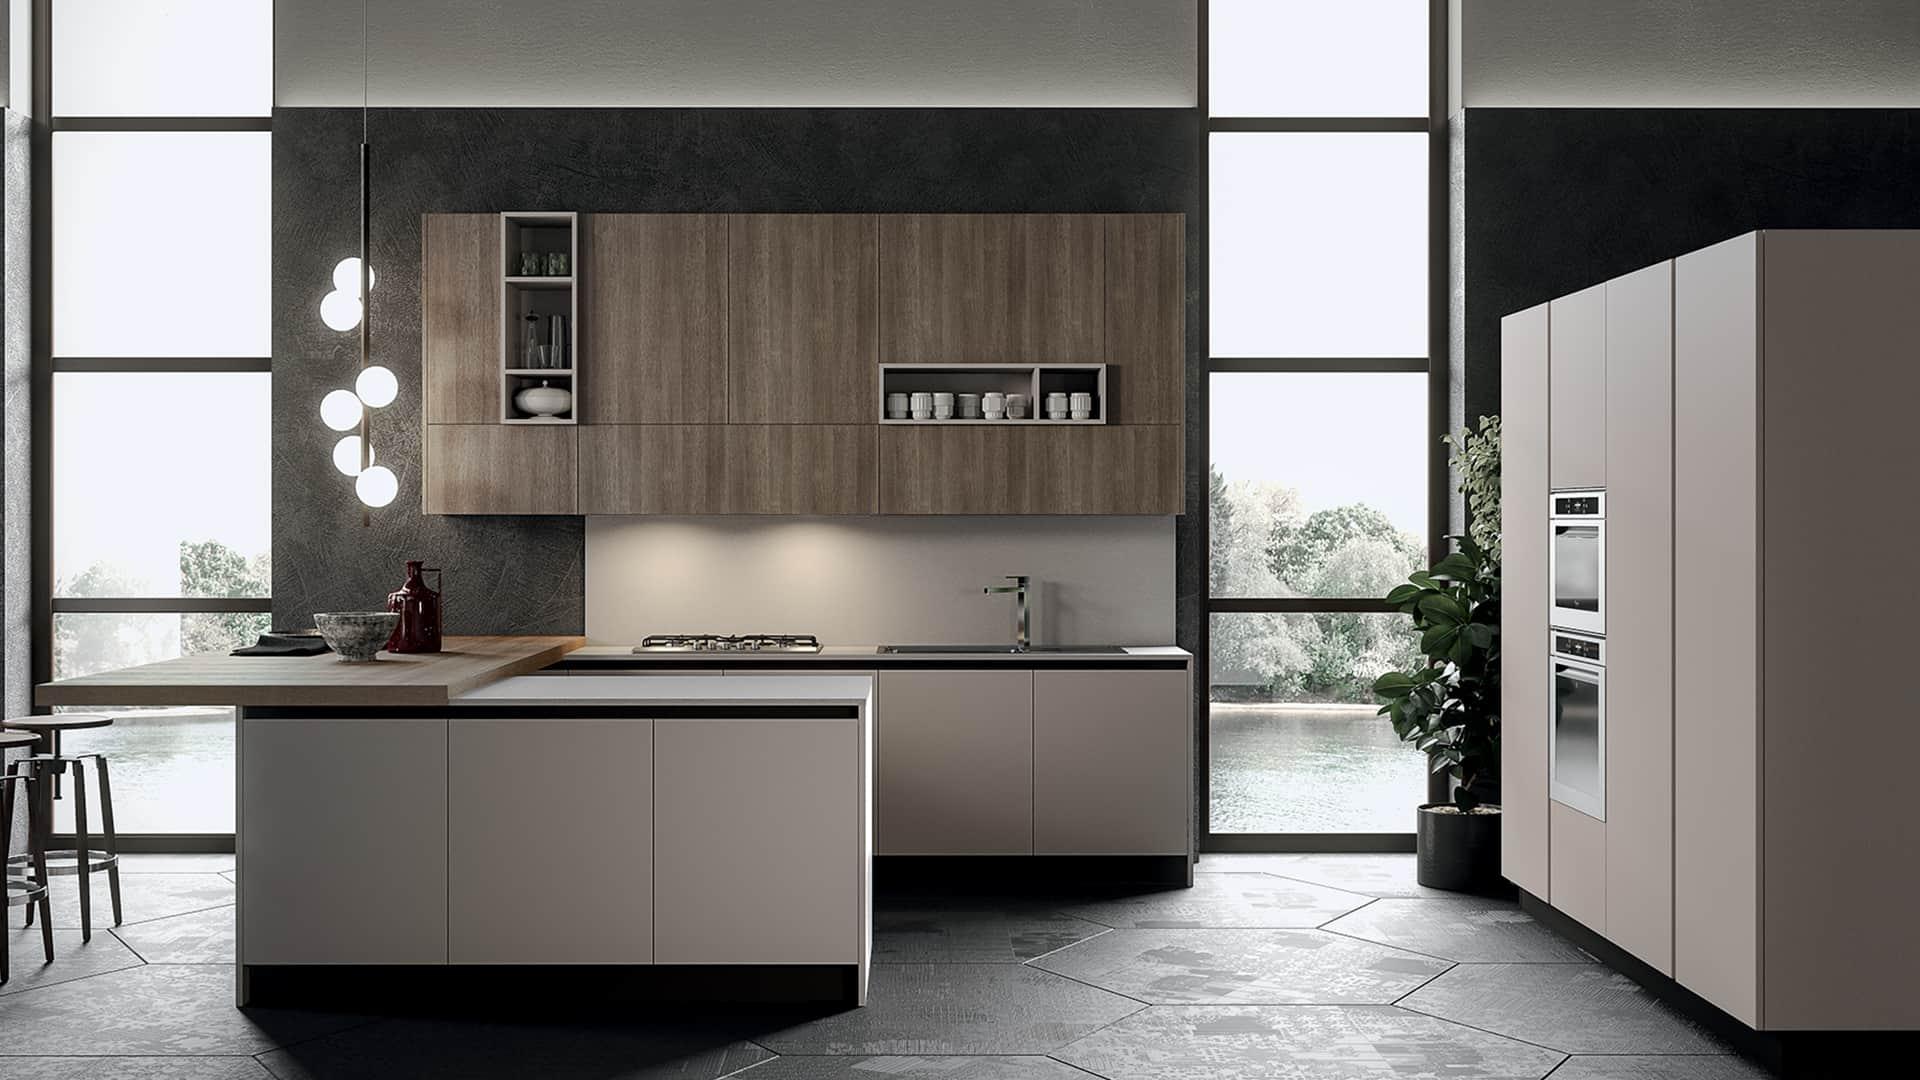 Cucine moderne con penisola padova for Cucina piccola moderna